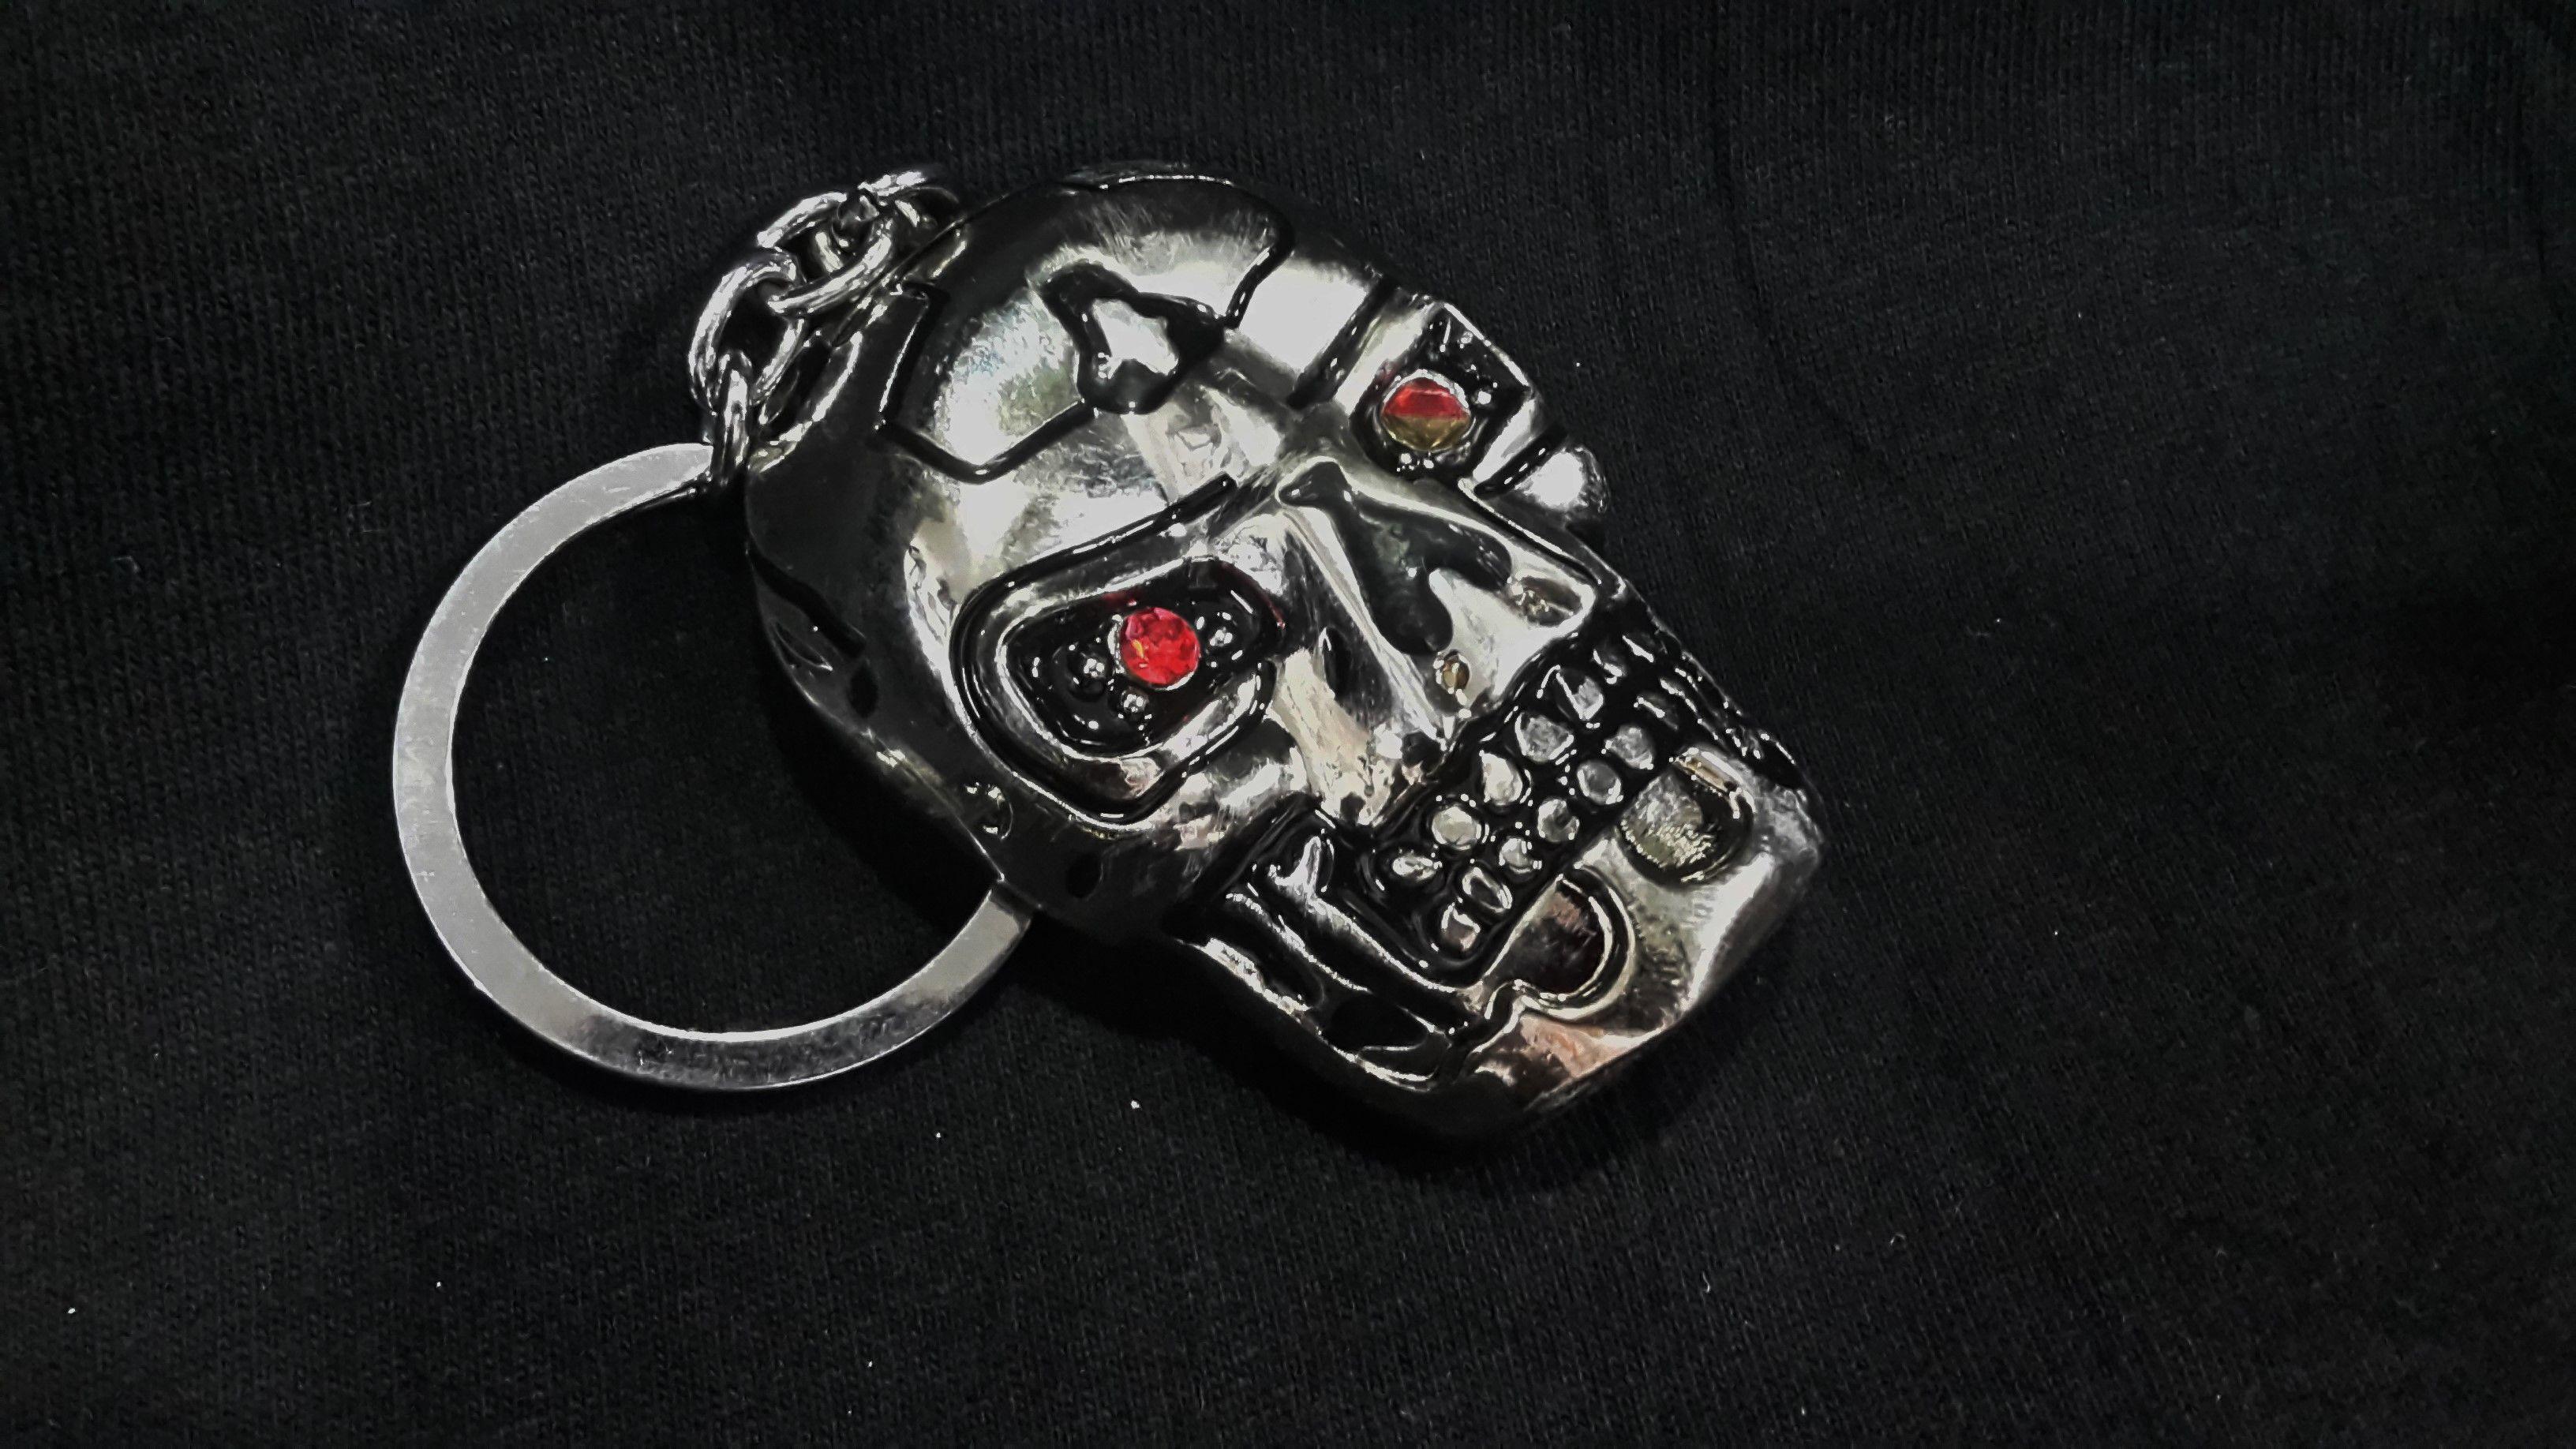 Llavero con la cara plana de endoesqueleto de Terminator